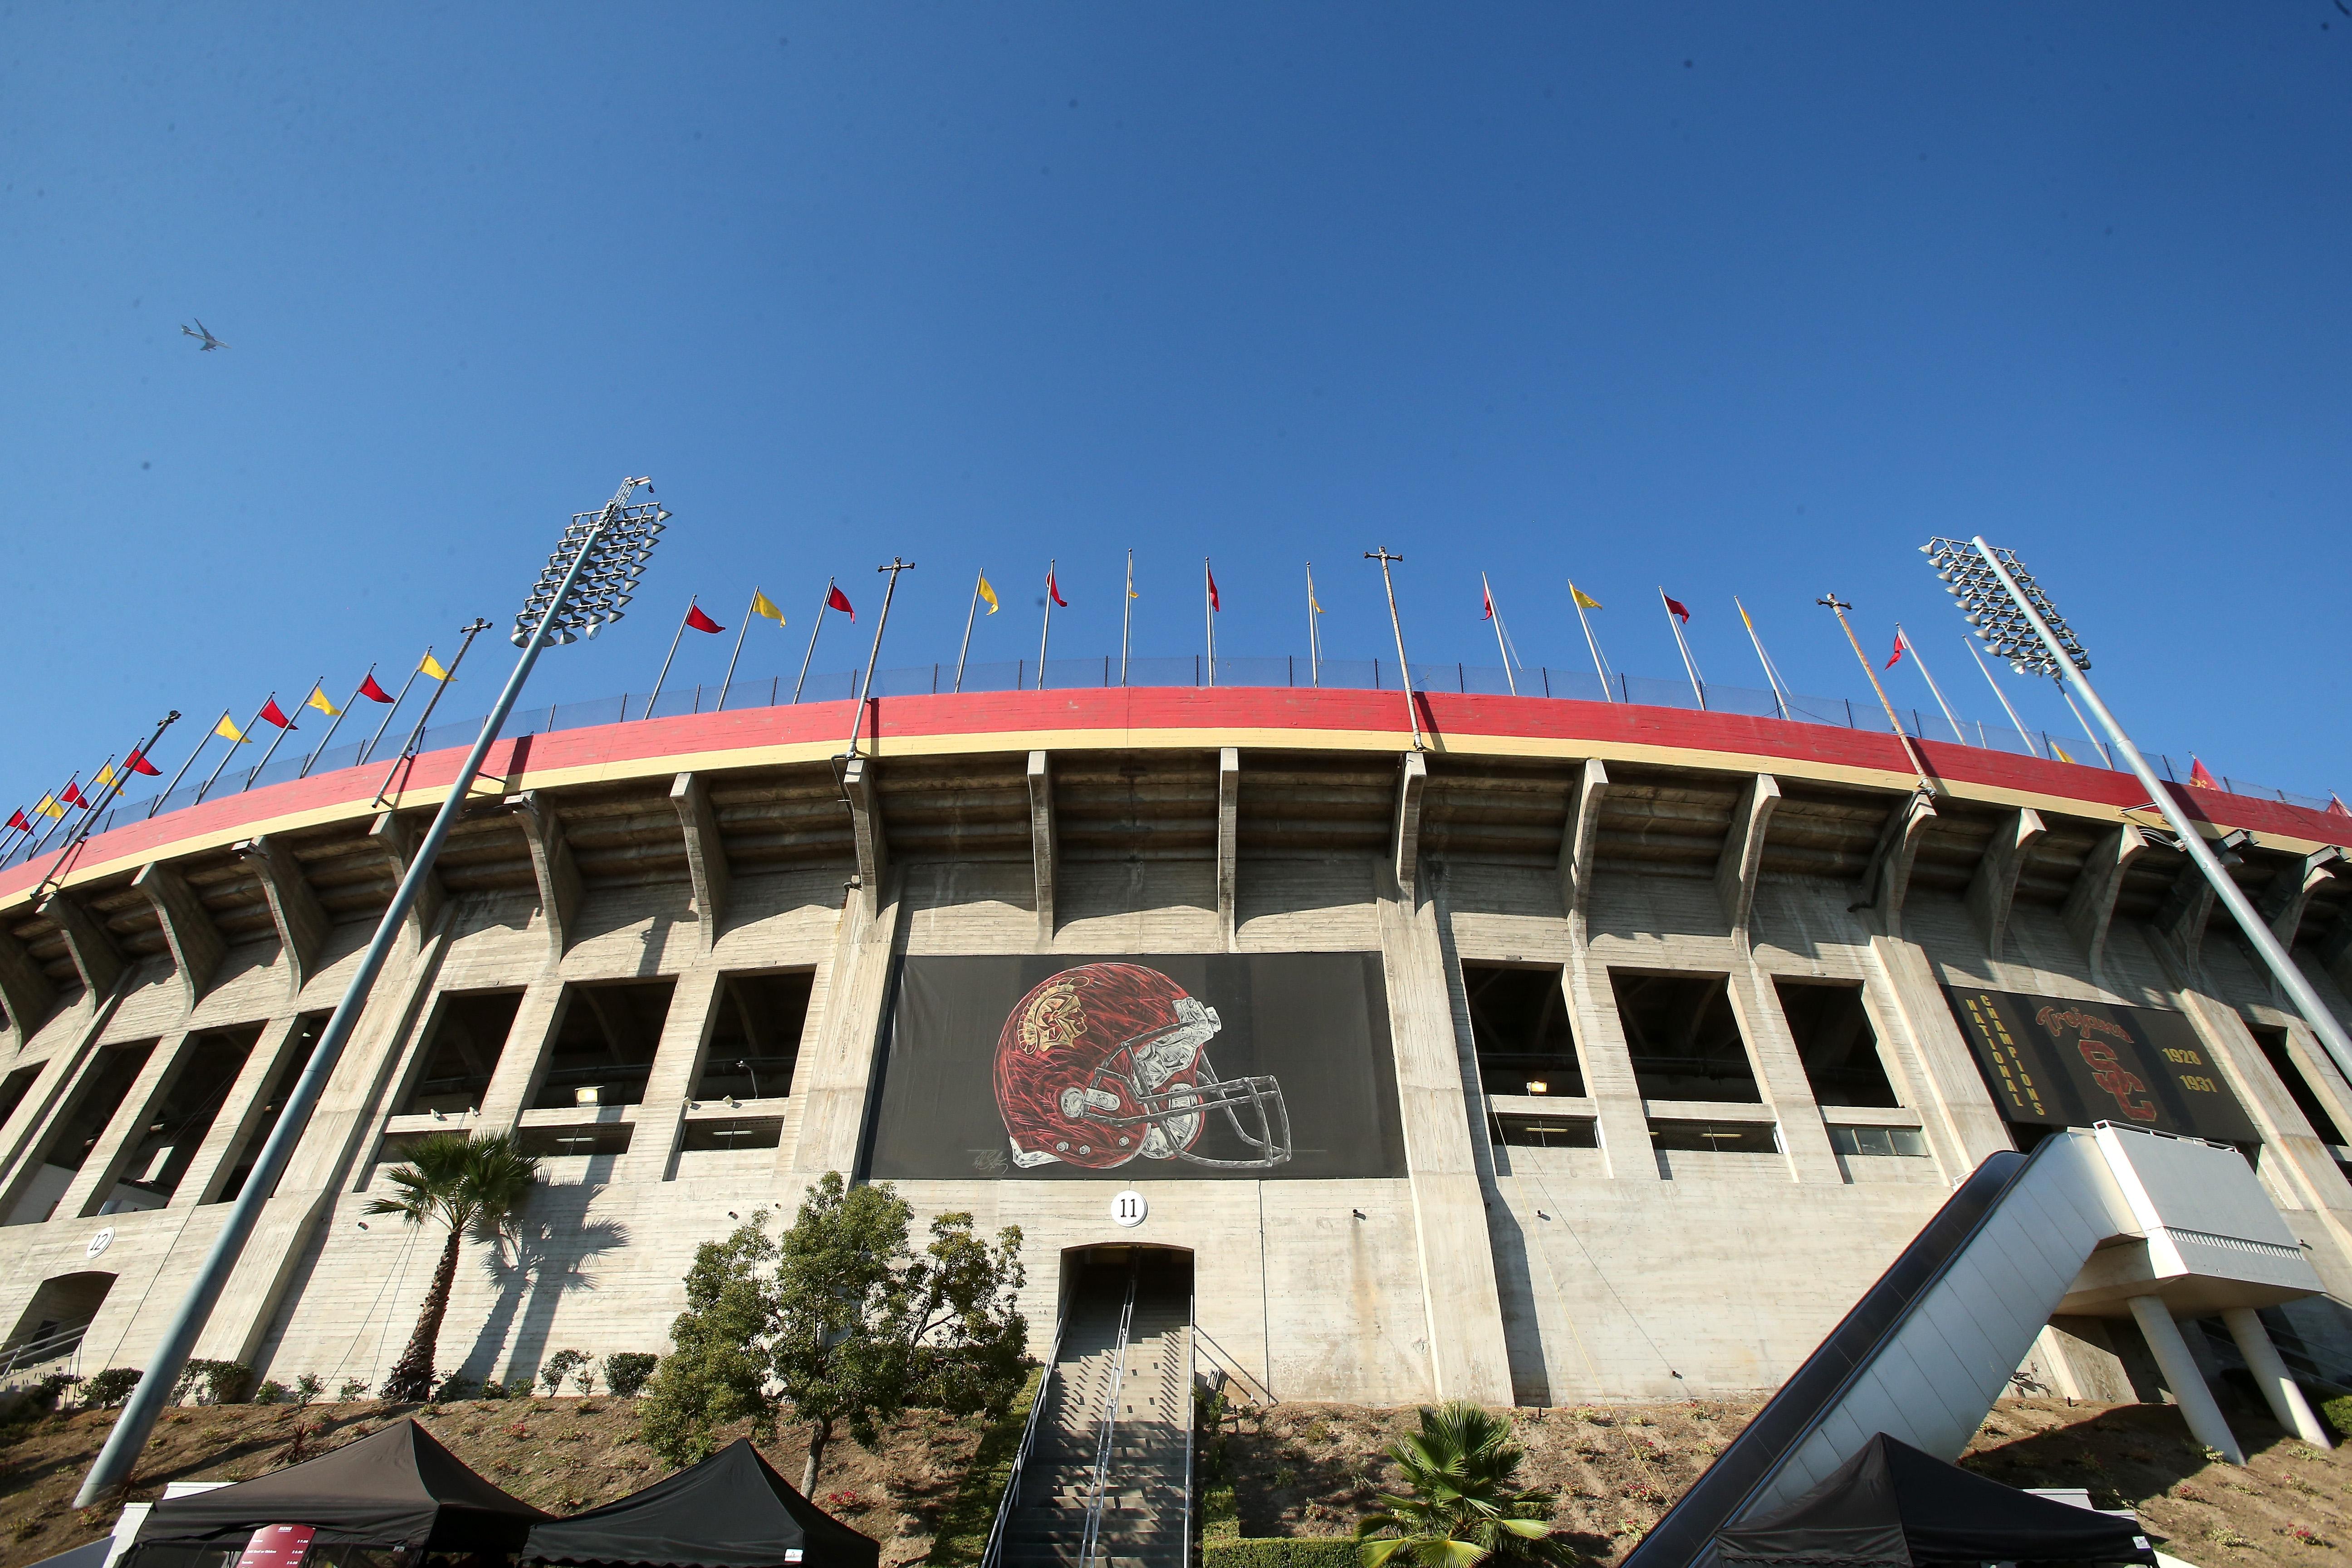 USC football in 2013